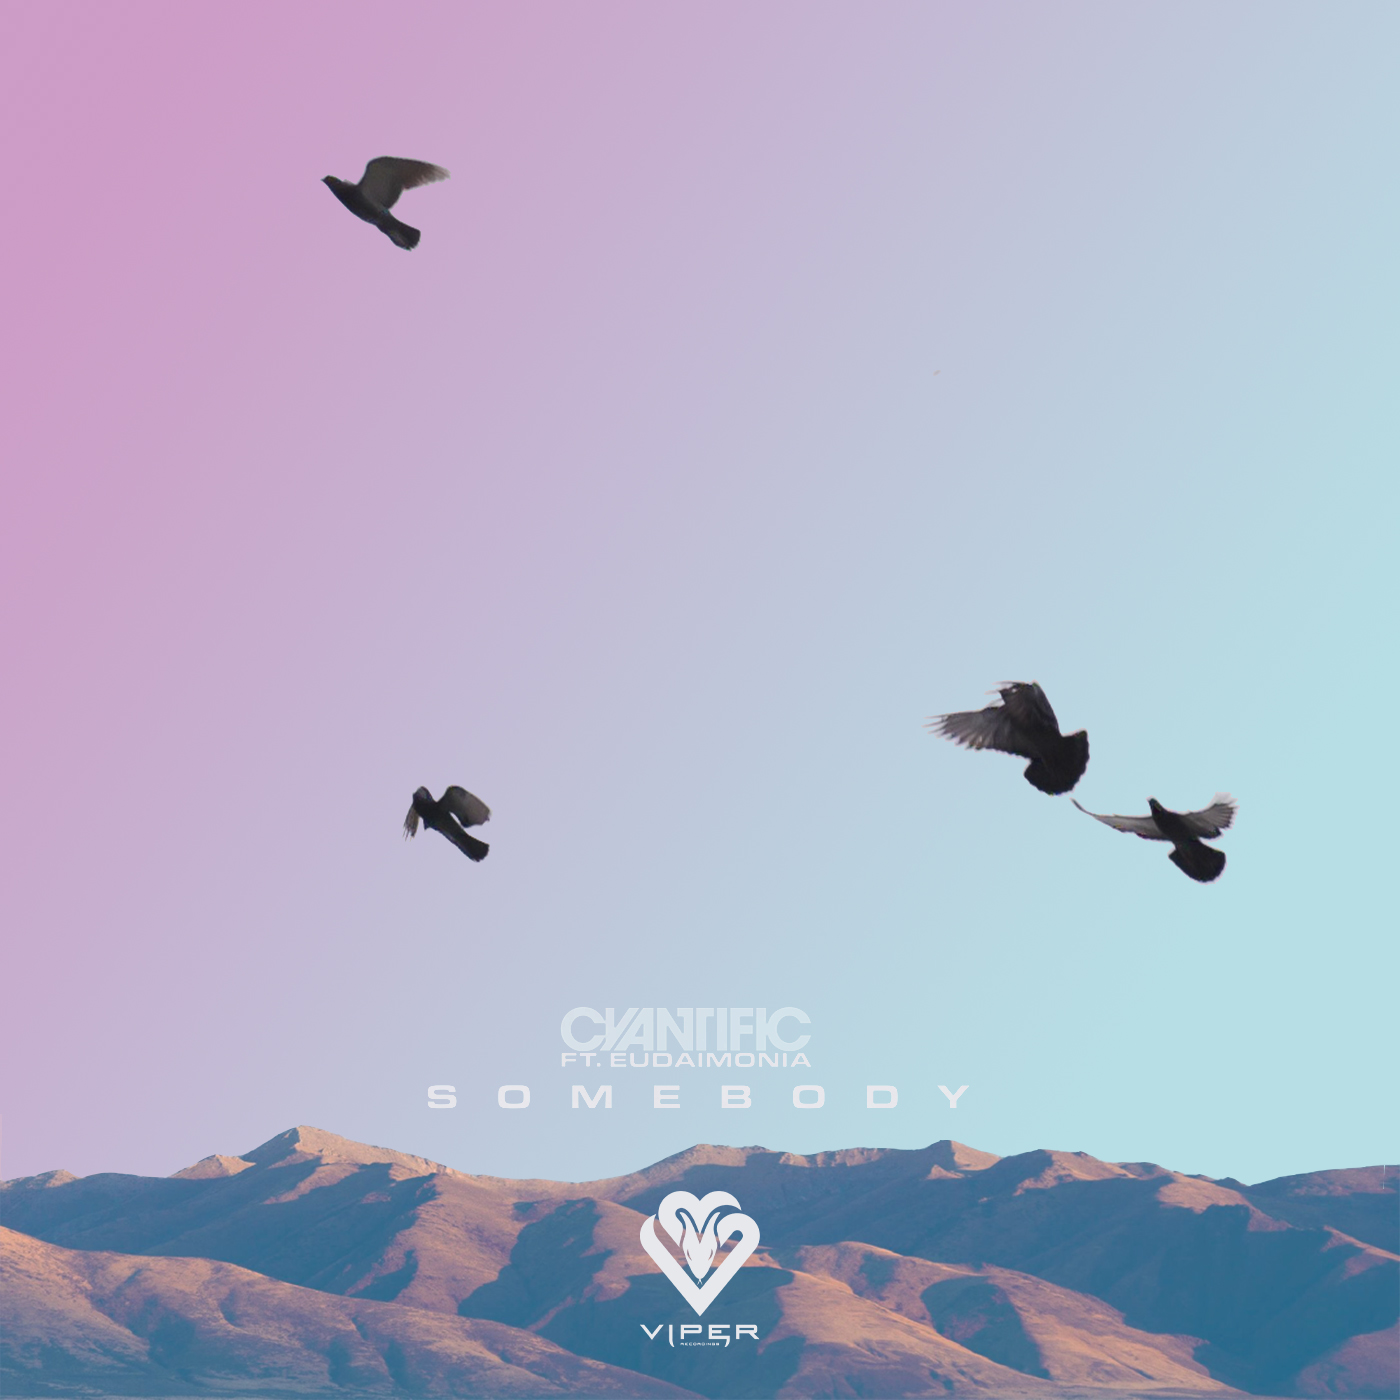 Cyantific feat. Eudaimonia - Somebody [VPR206]